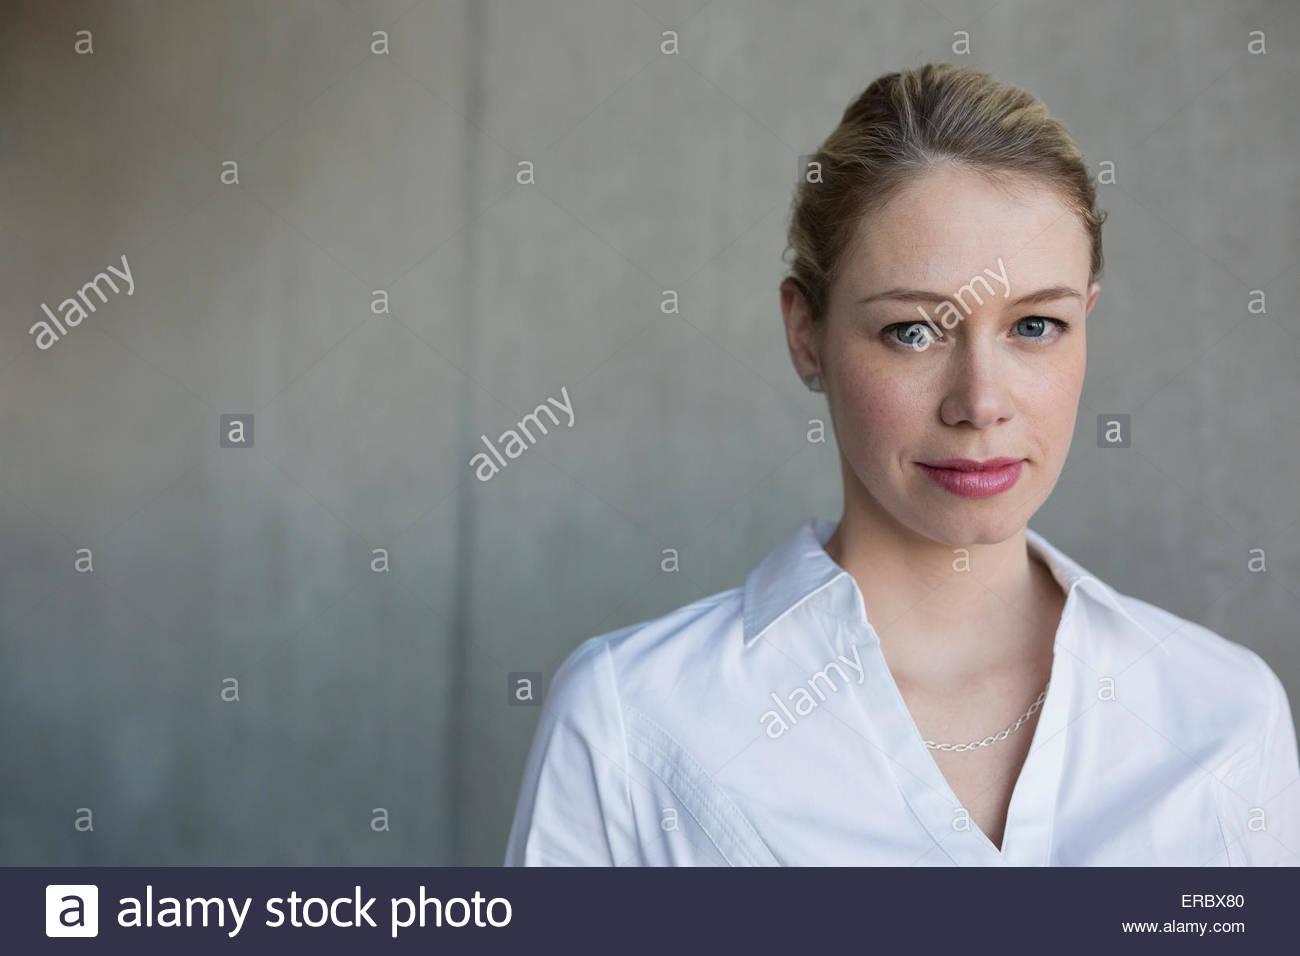 Portrait confident businesswoman with blonde hair - Stock Image